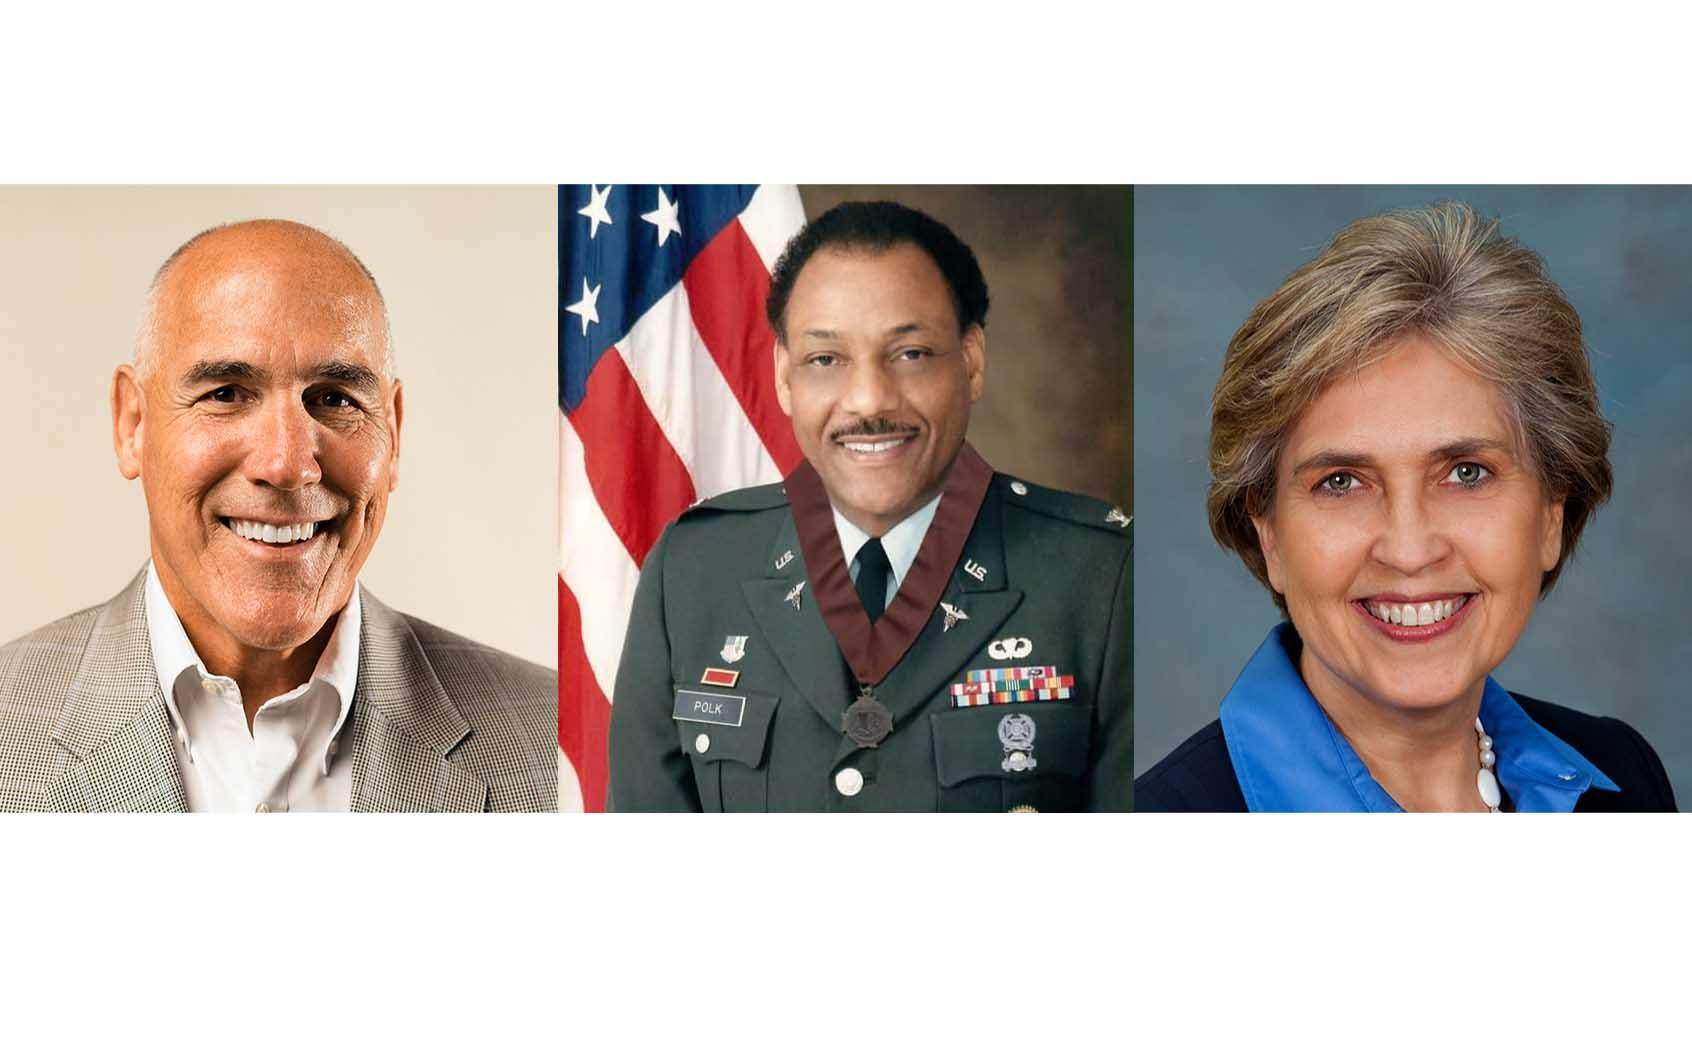 John Miller, Col. Polk and Cynthia Rougeau